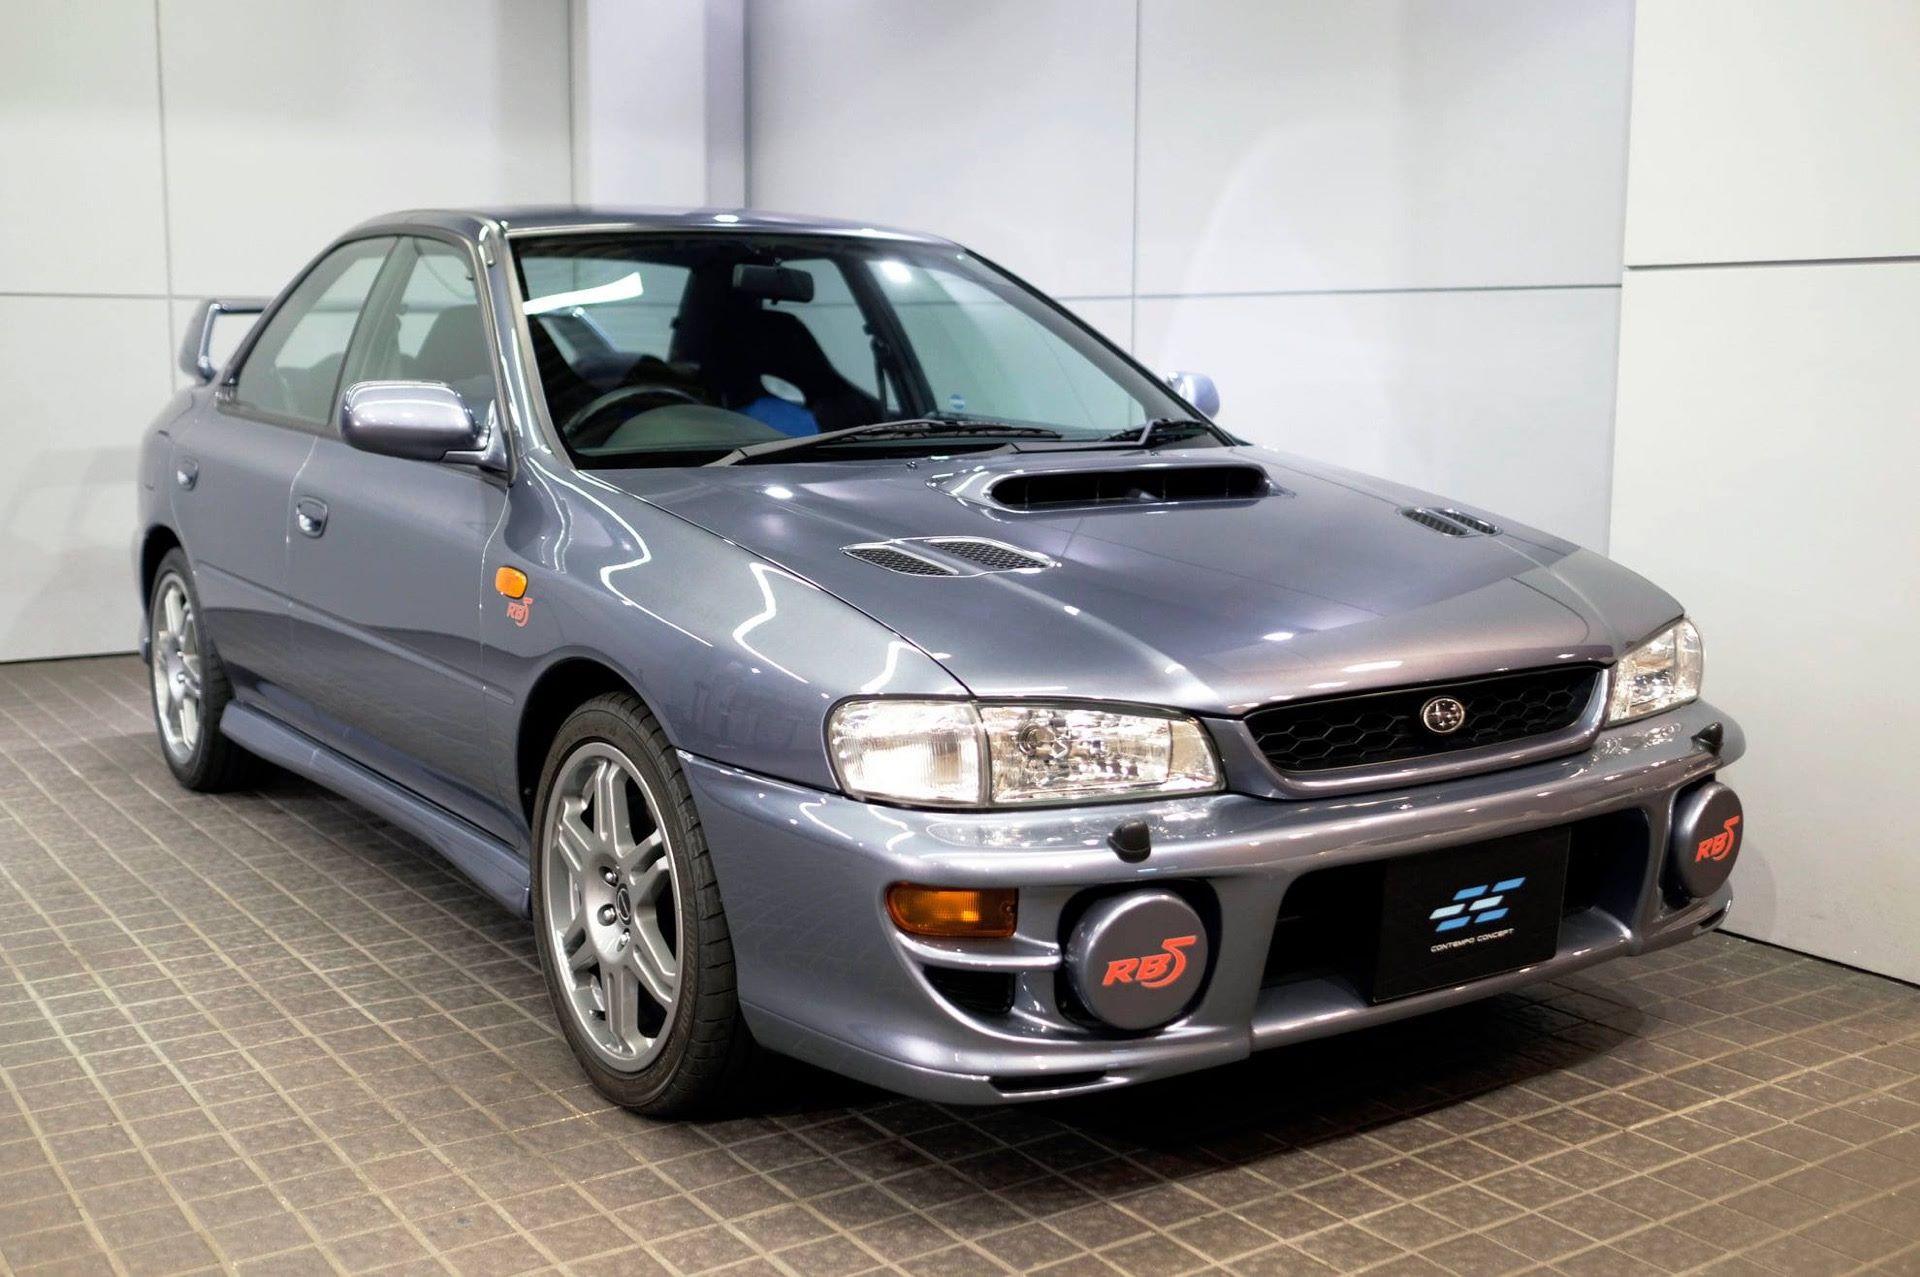 Subaru-Impreza-RB5-1999-1